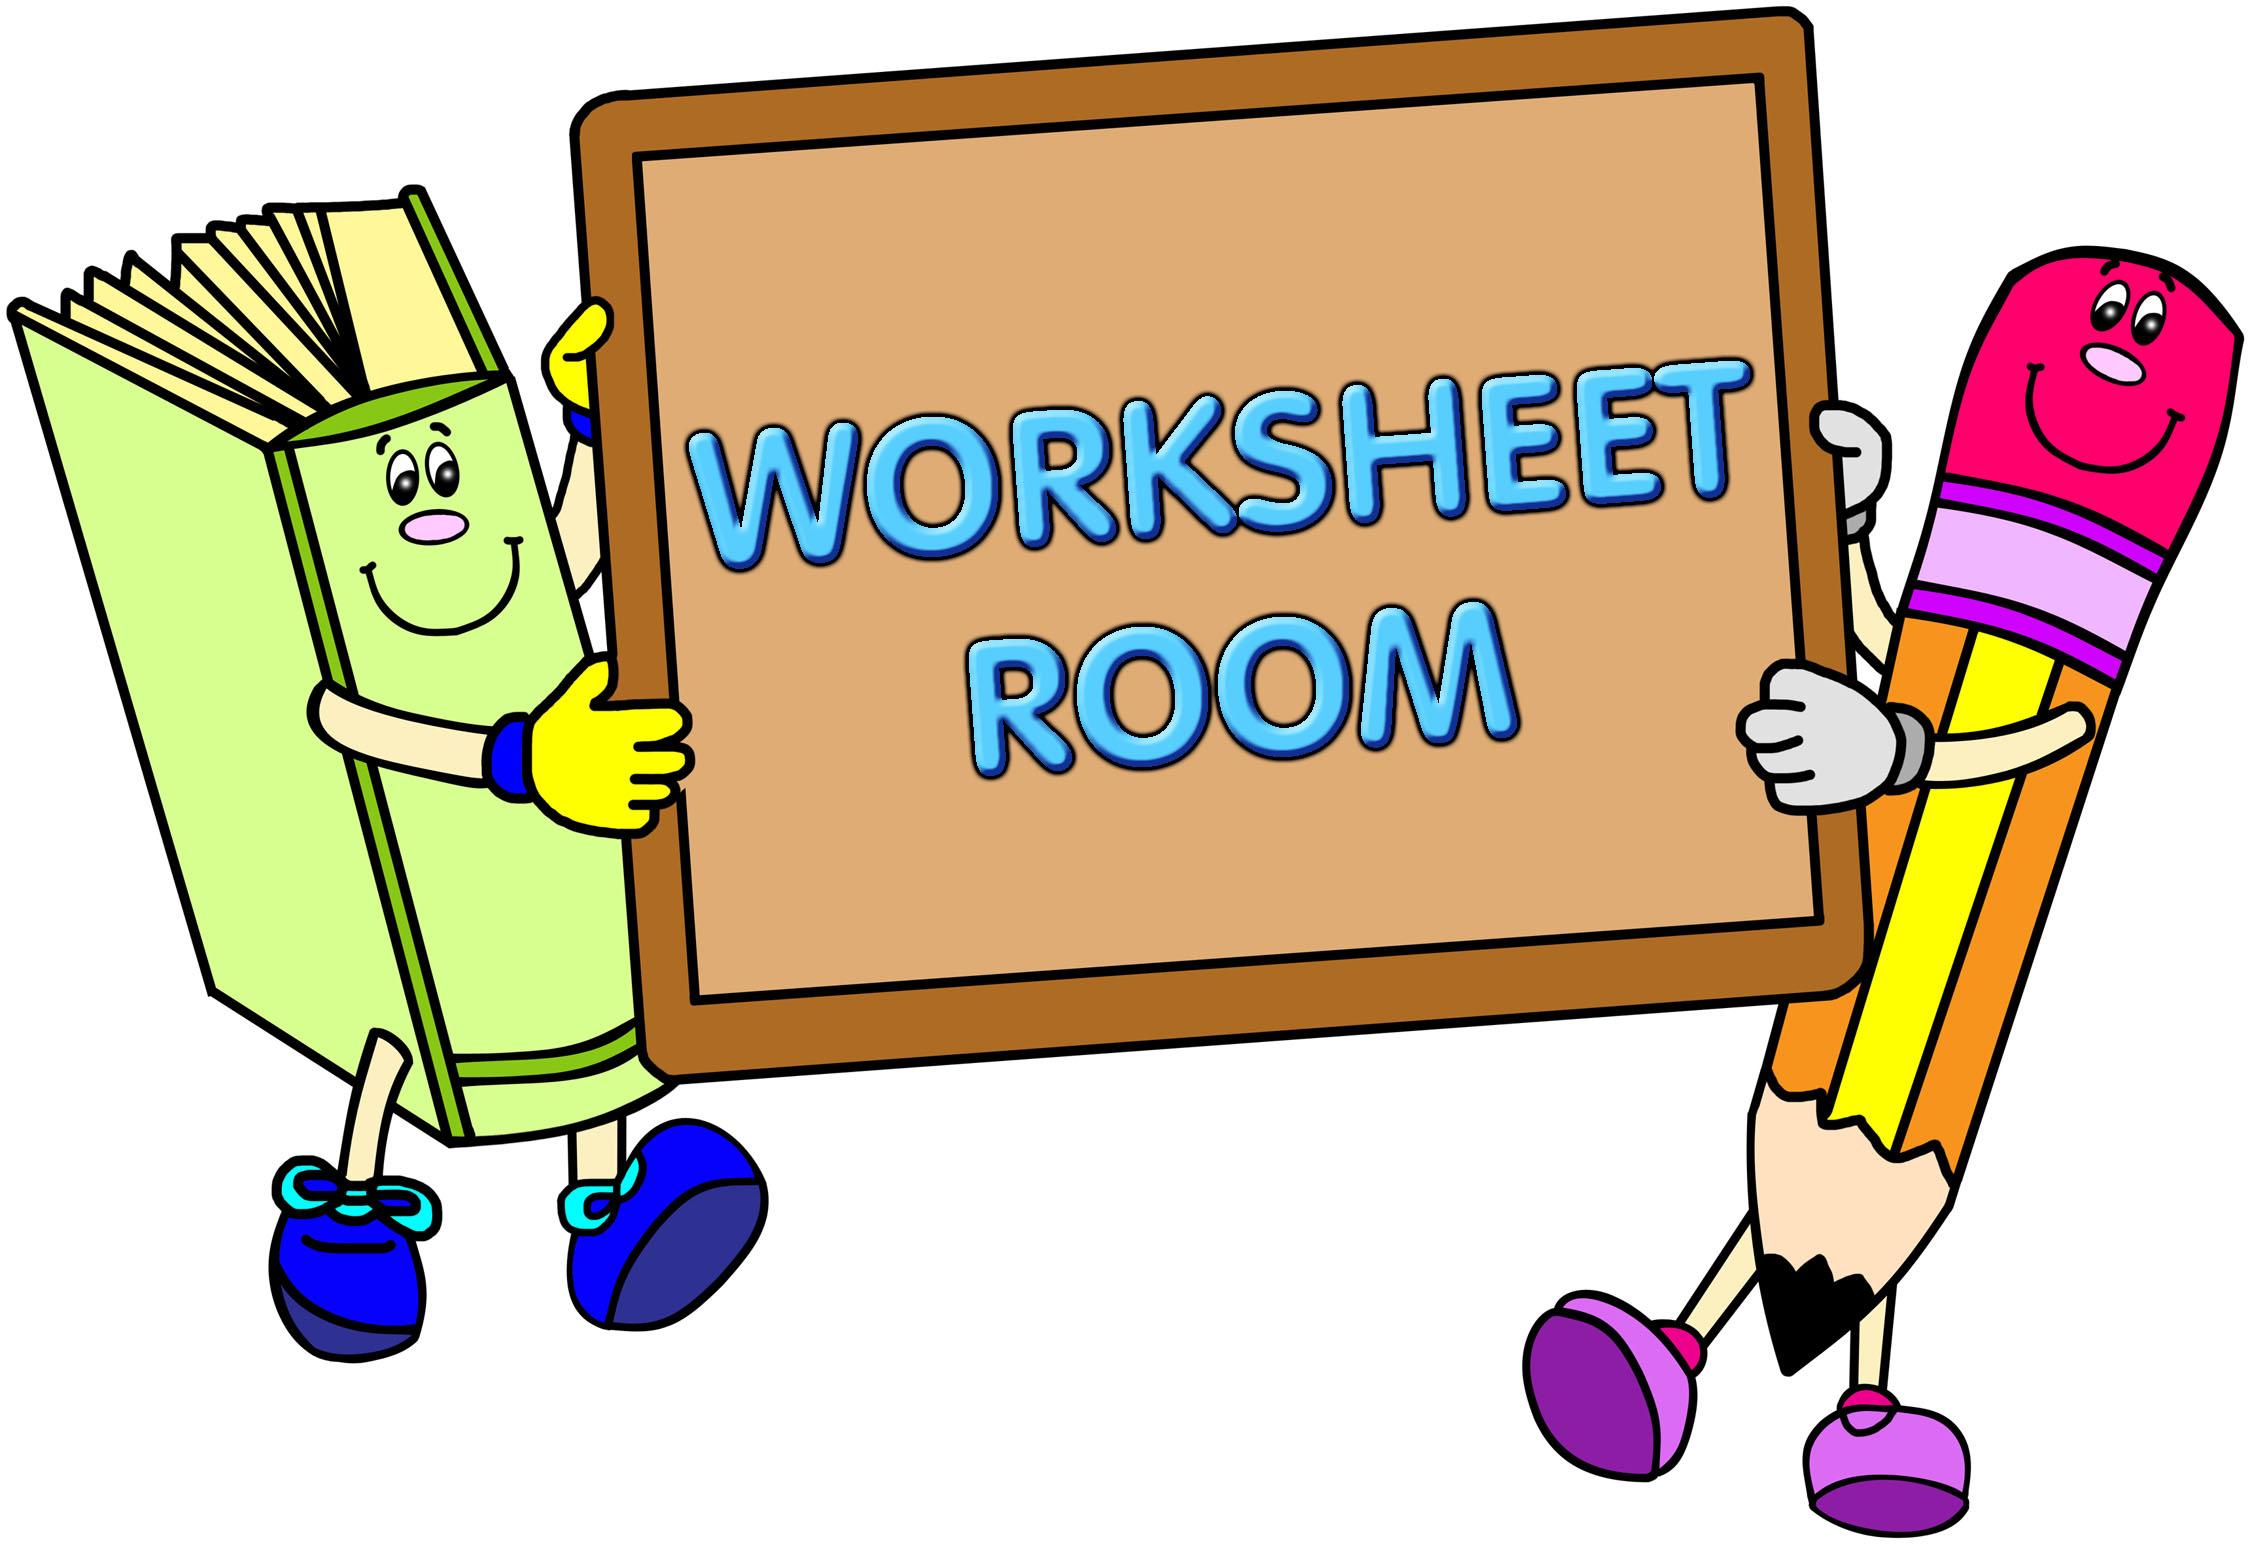 Clipart Worksheet At Getdrawings